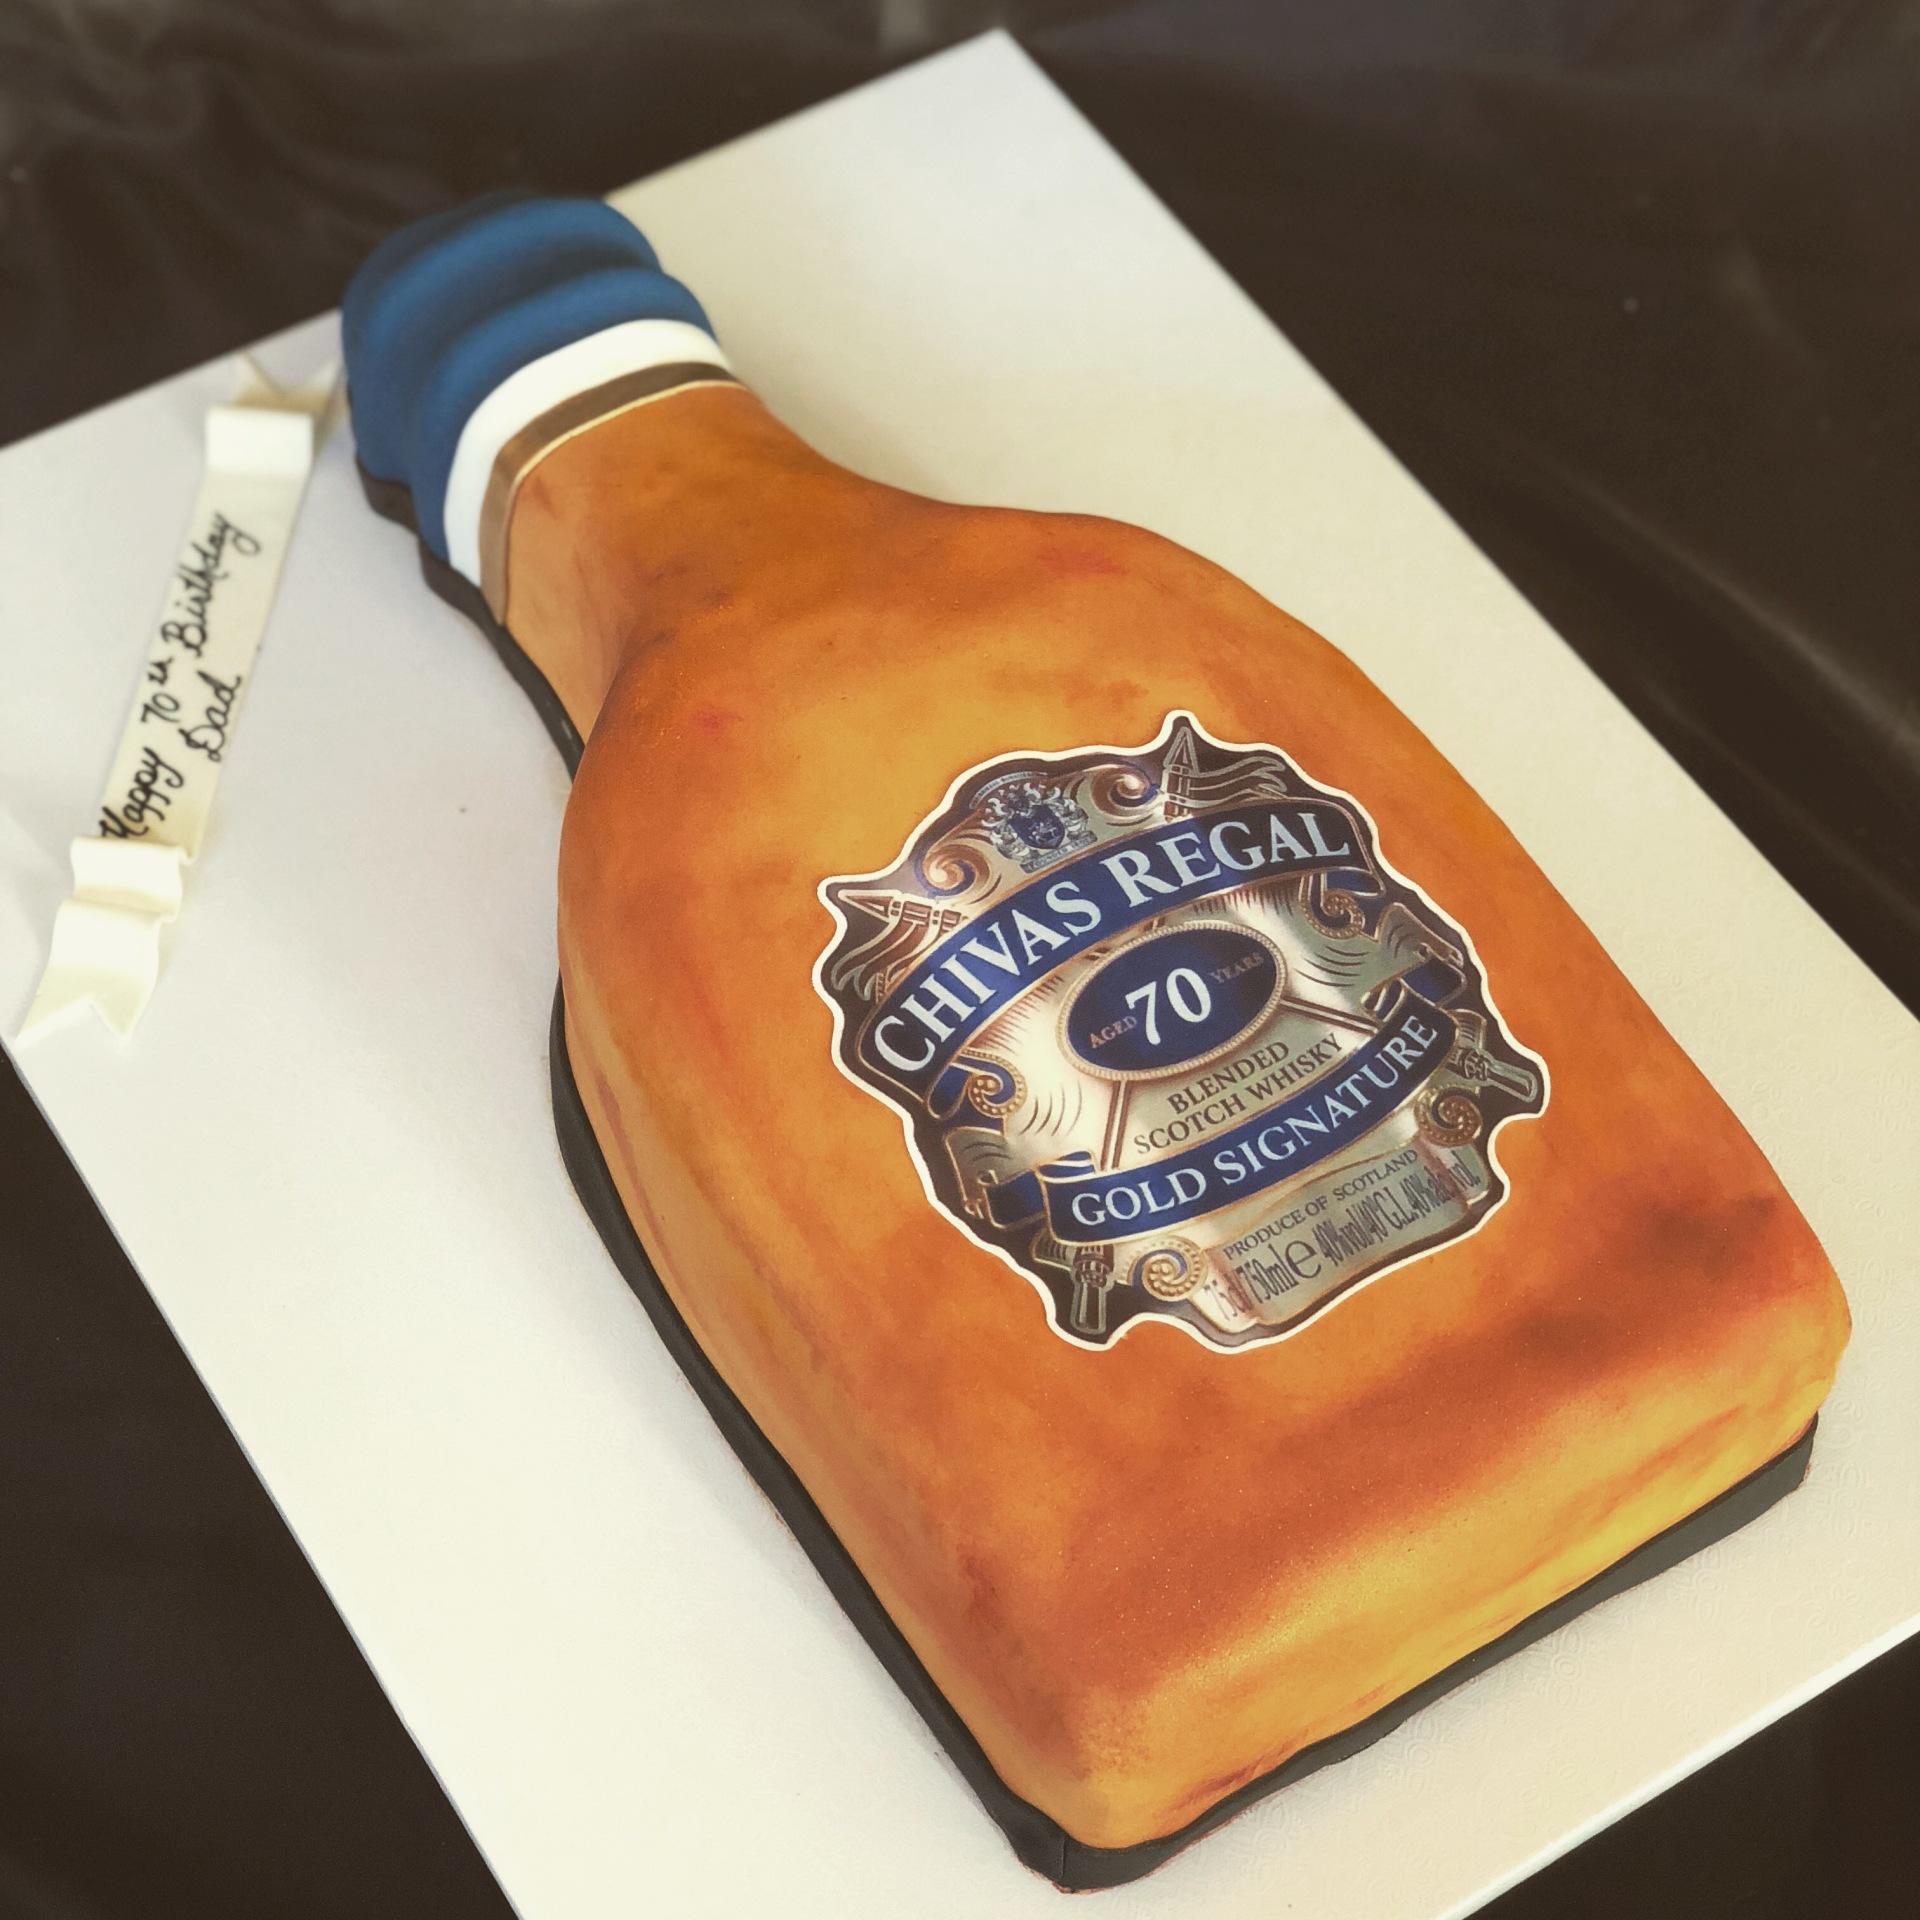 Chivas Regal carved bottle fondant cake